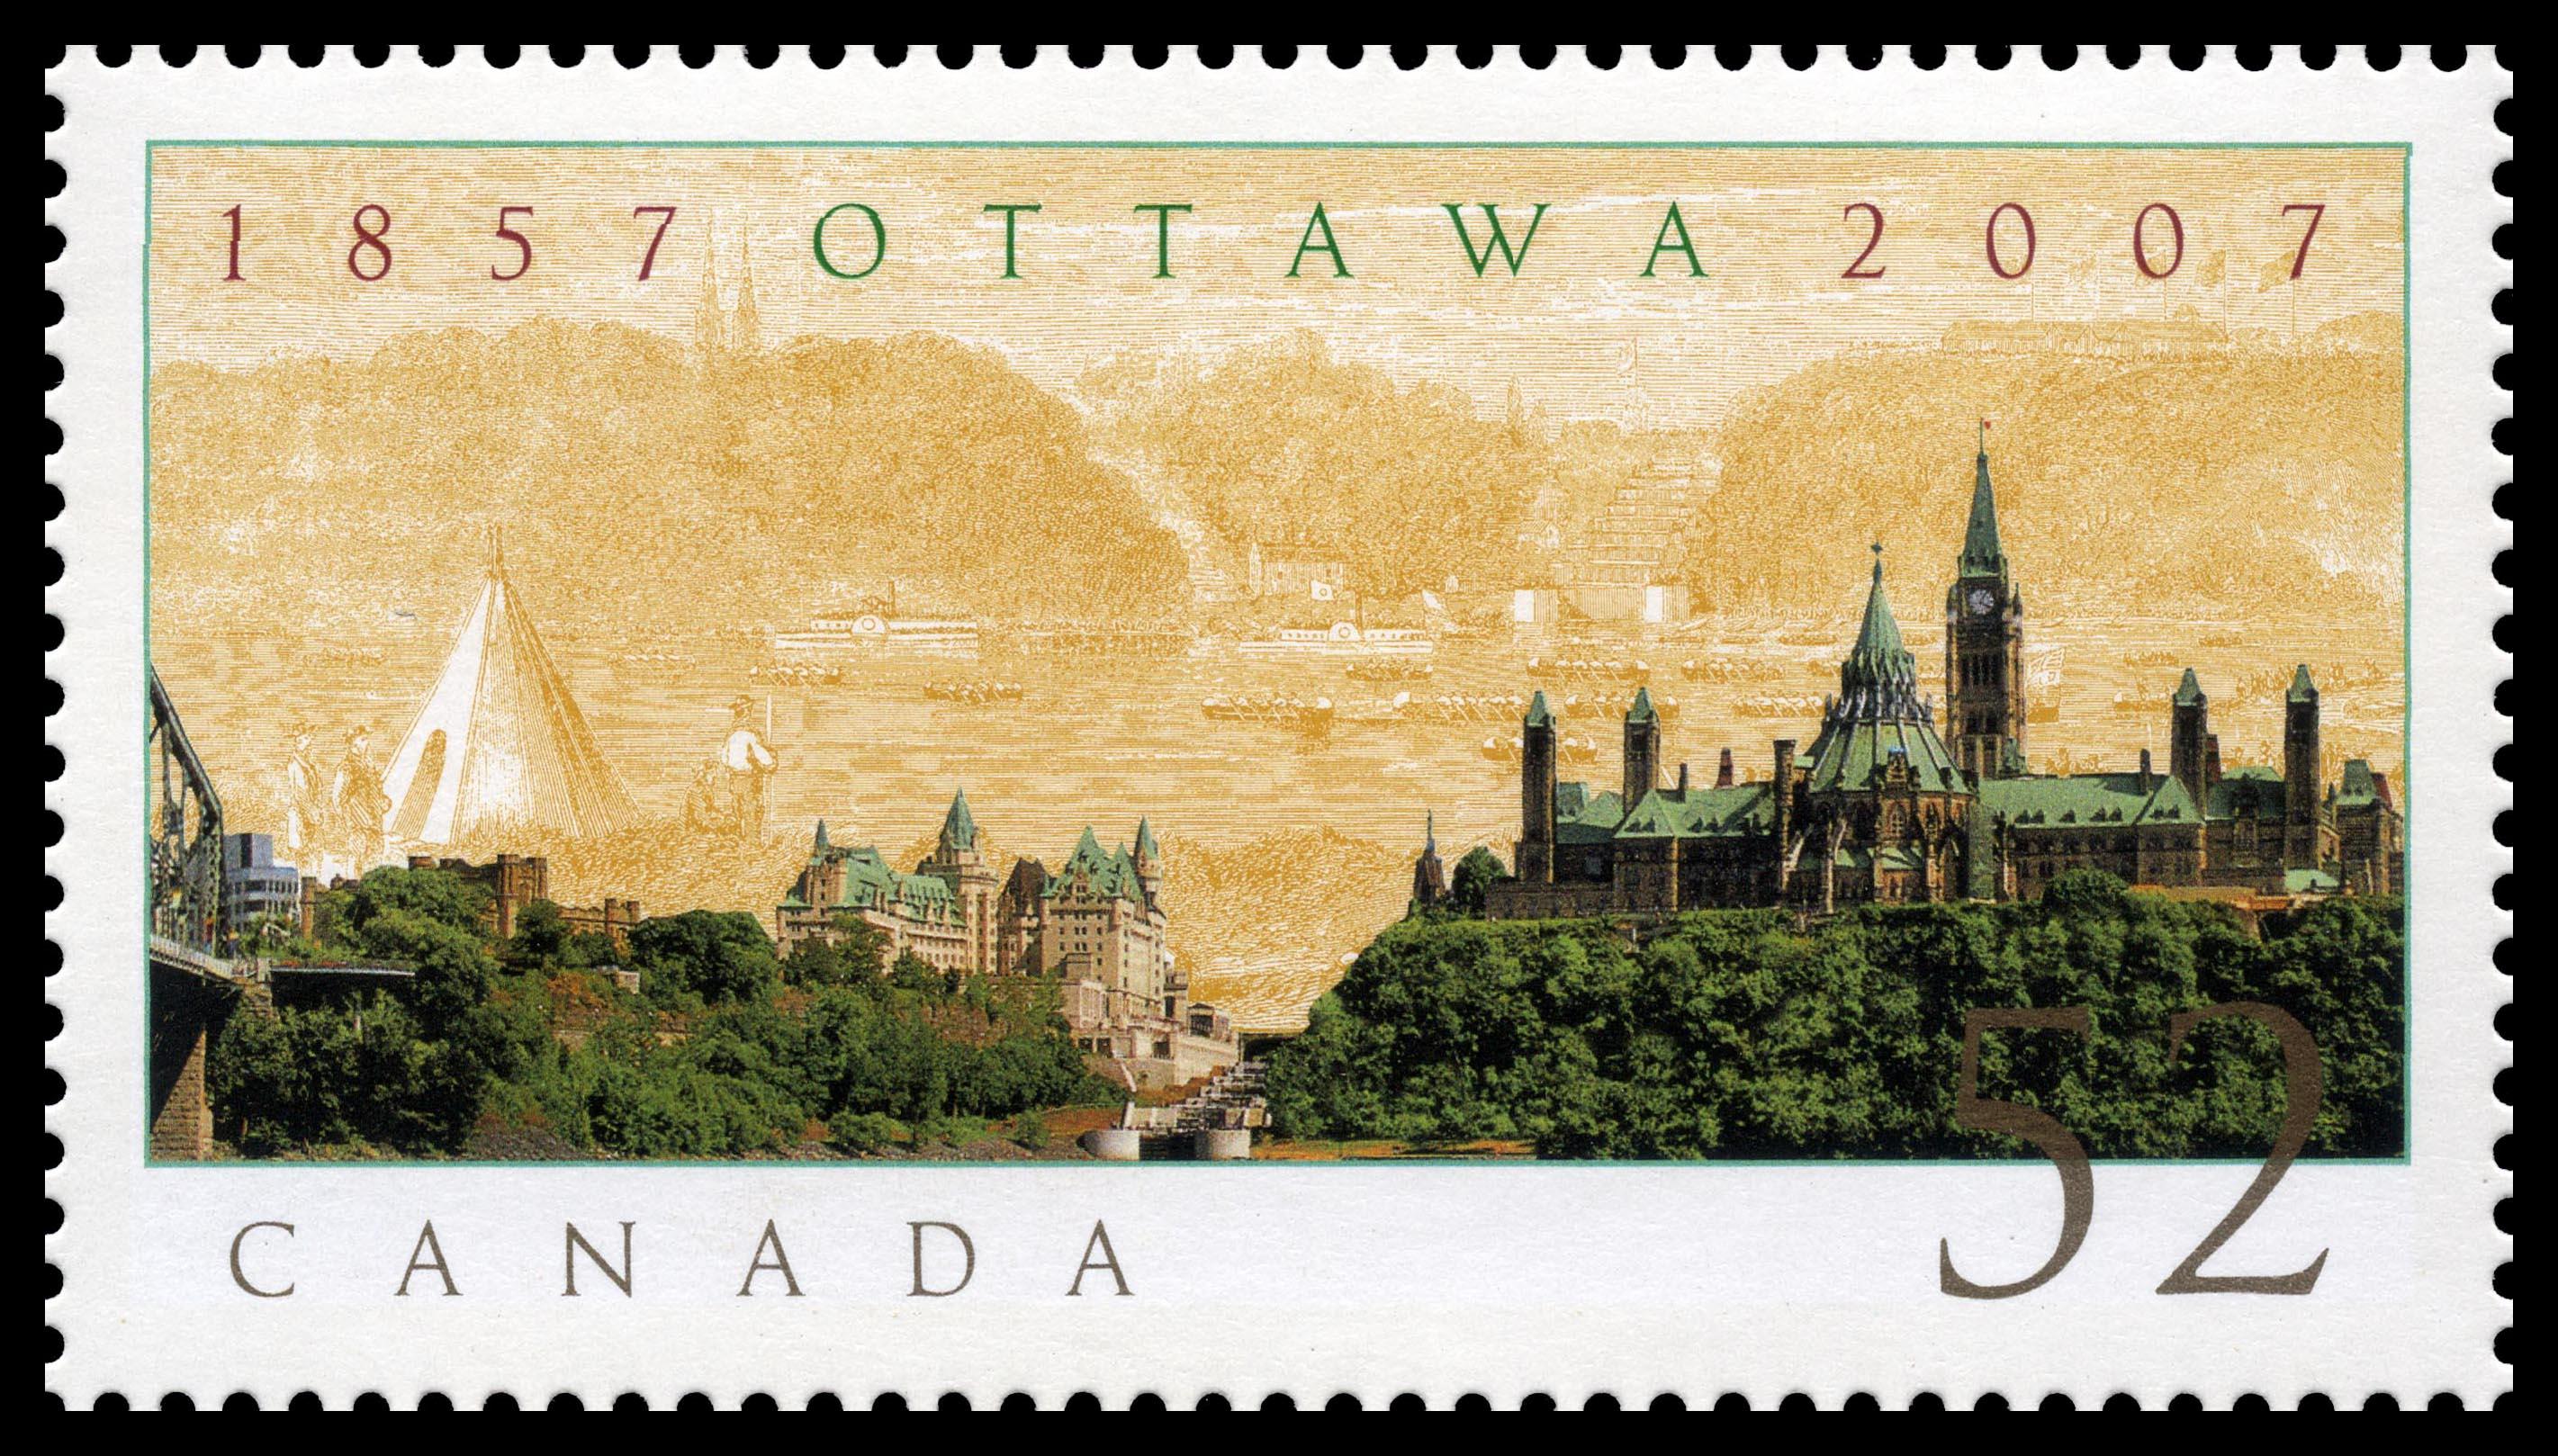 Ottawa - 1857-2007 Canada Postage Stamp